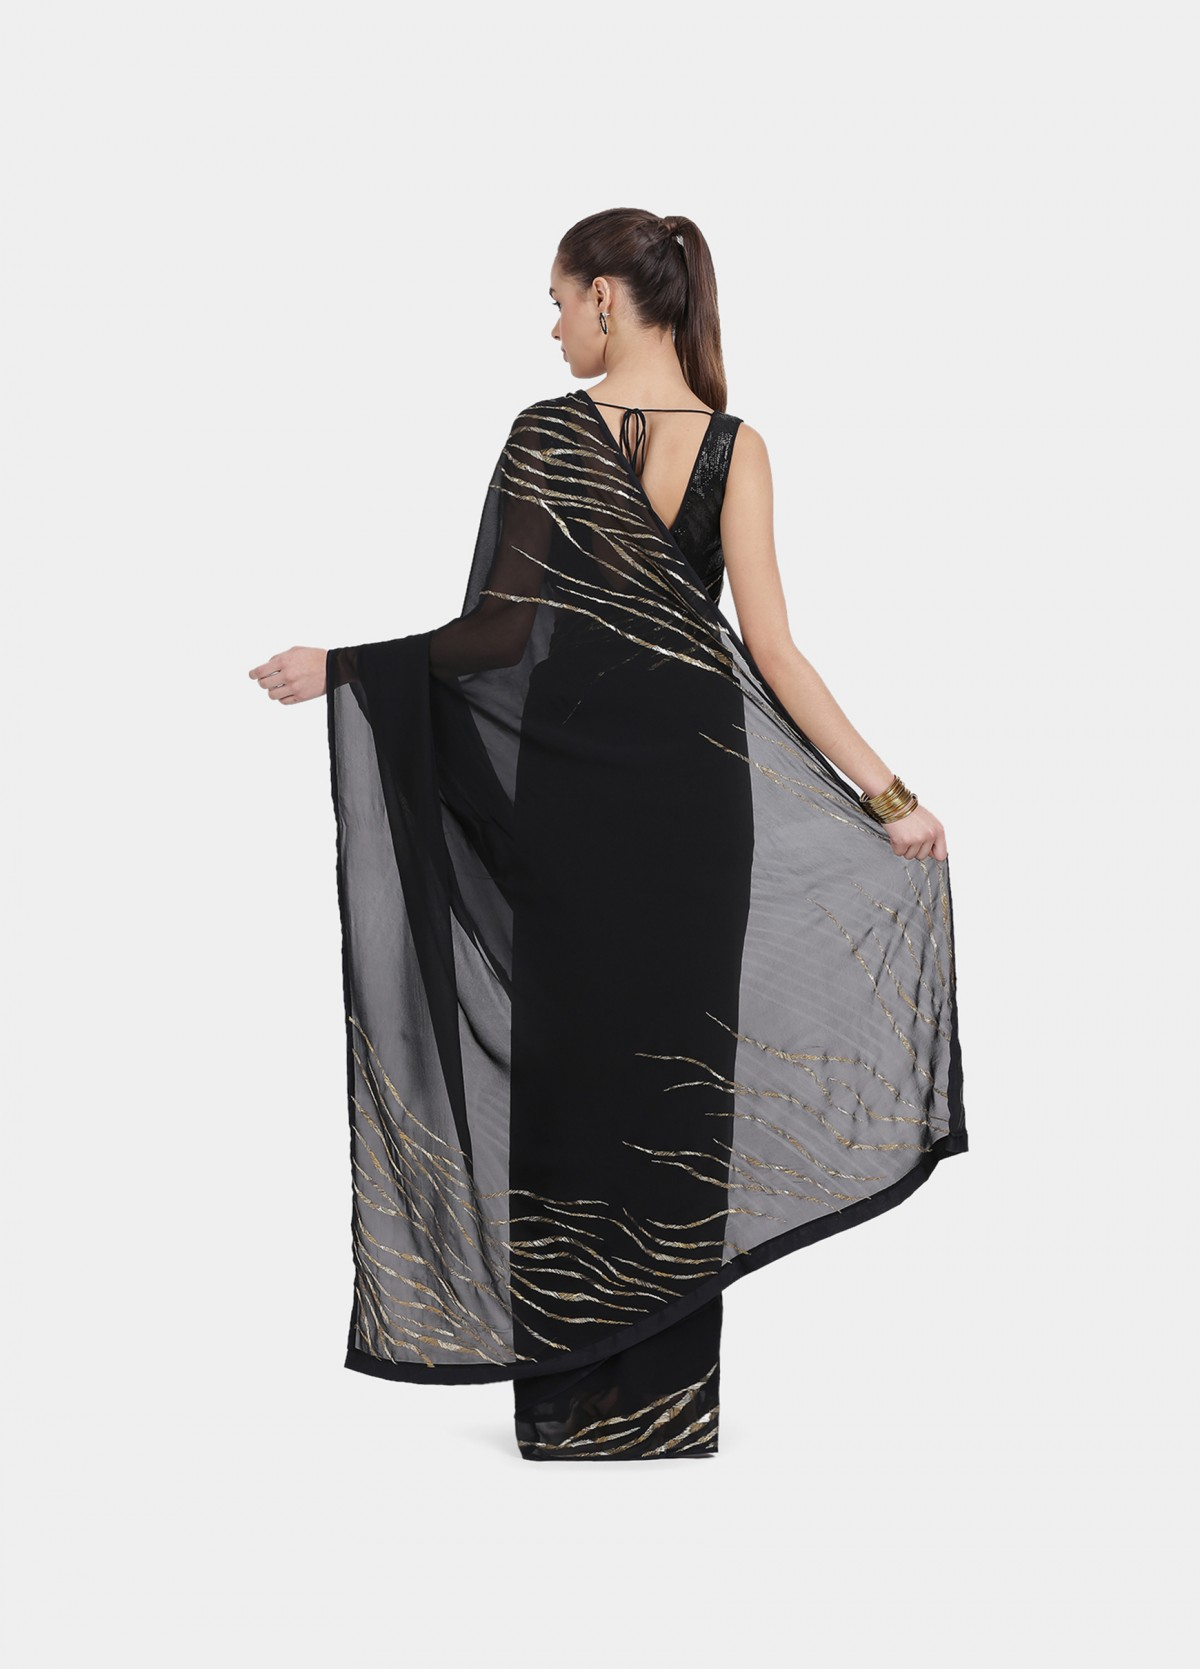 The Marti Sari